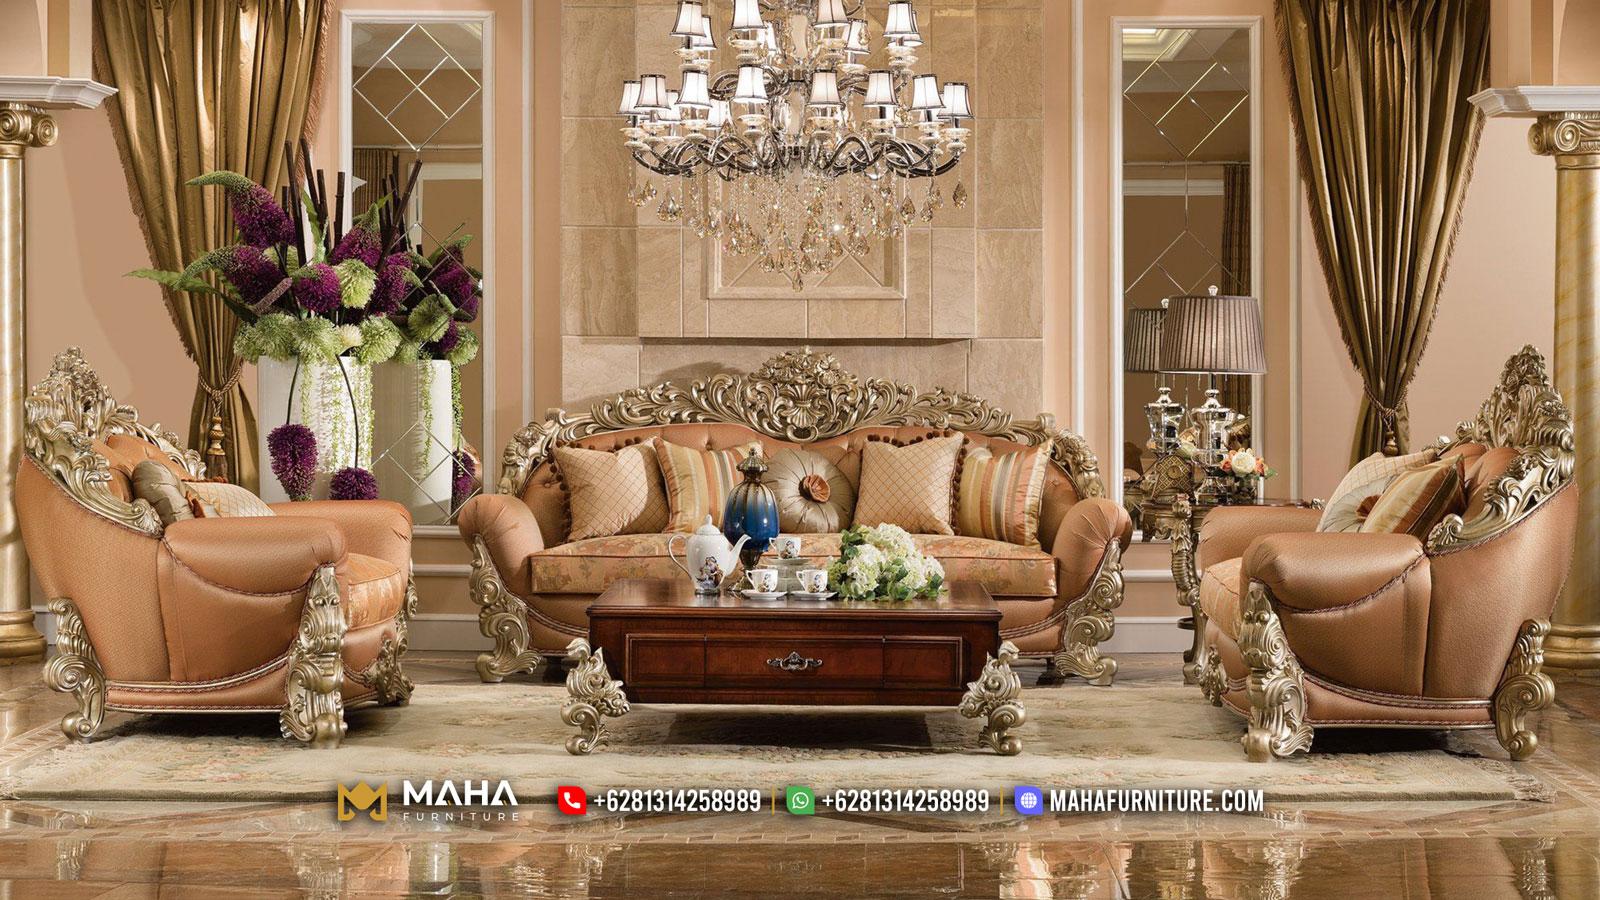 Kursi Sofa Tamu Mewah Jepara Luxury Majestic Design Glorious MF28